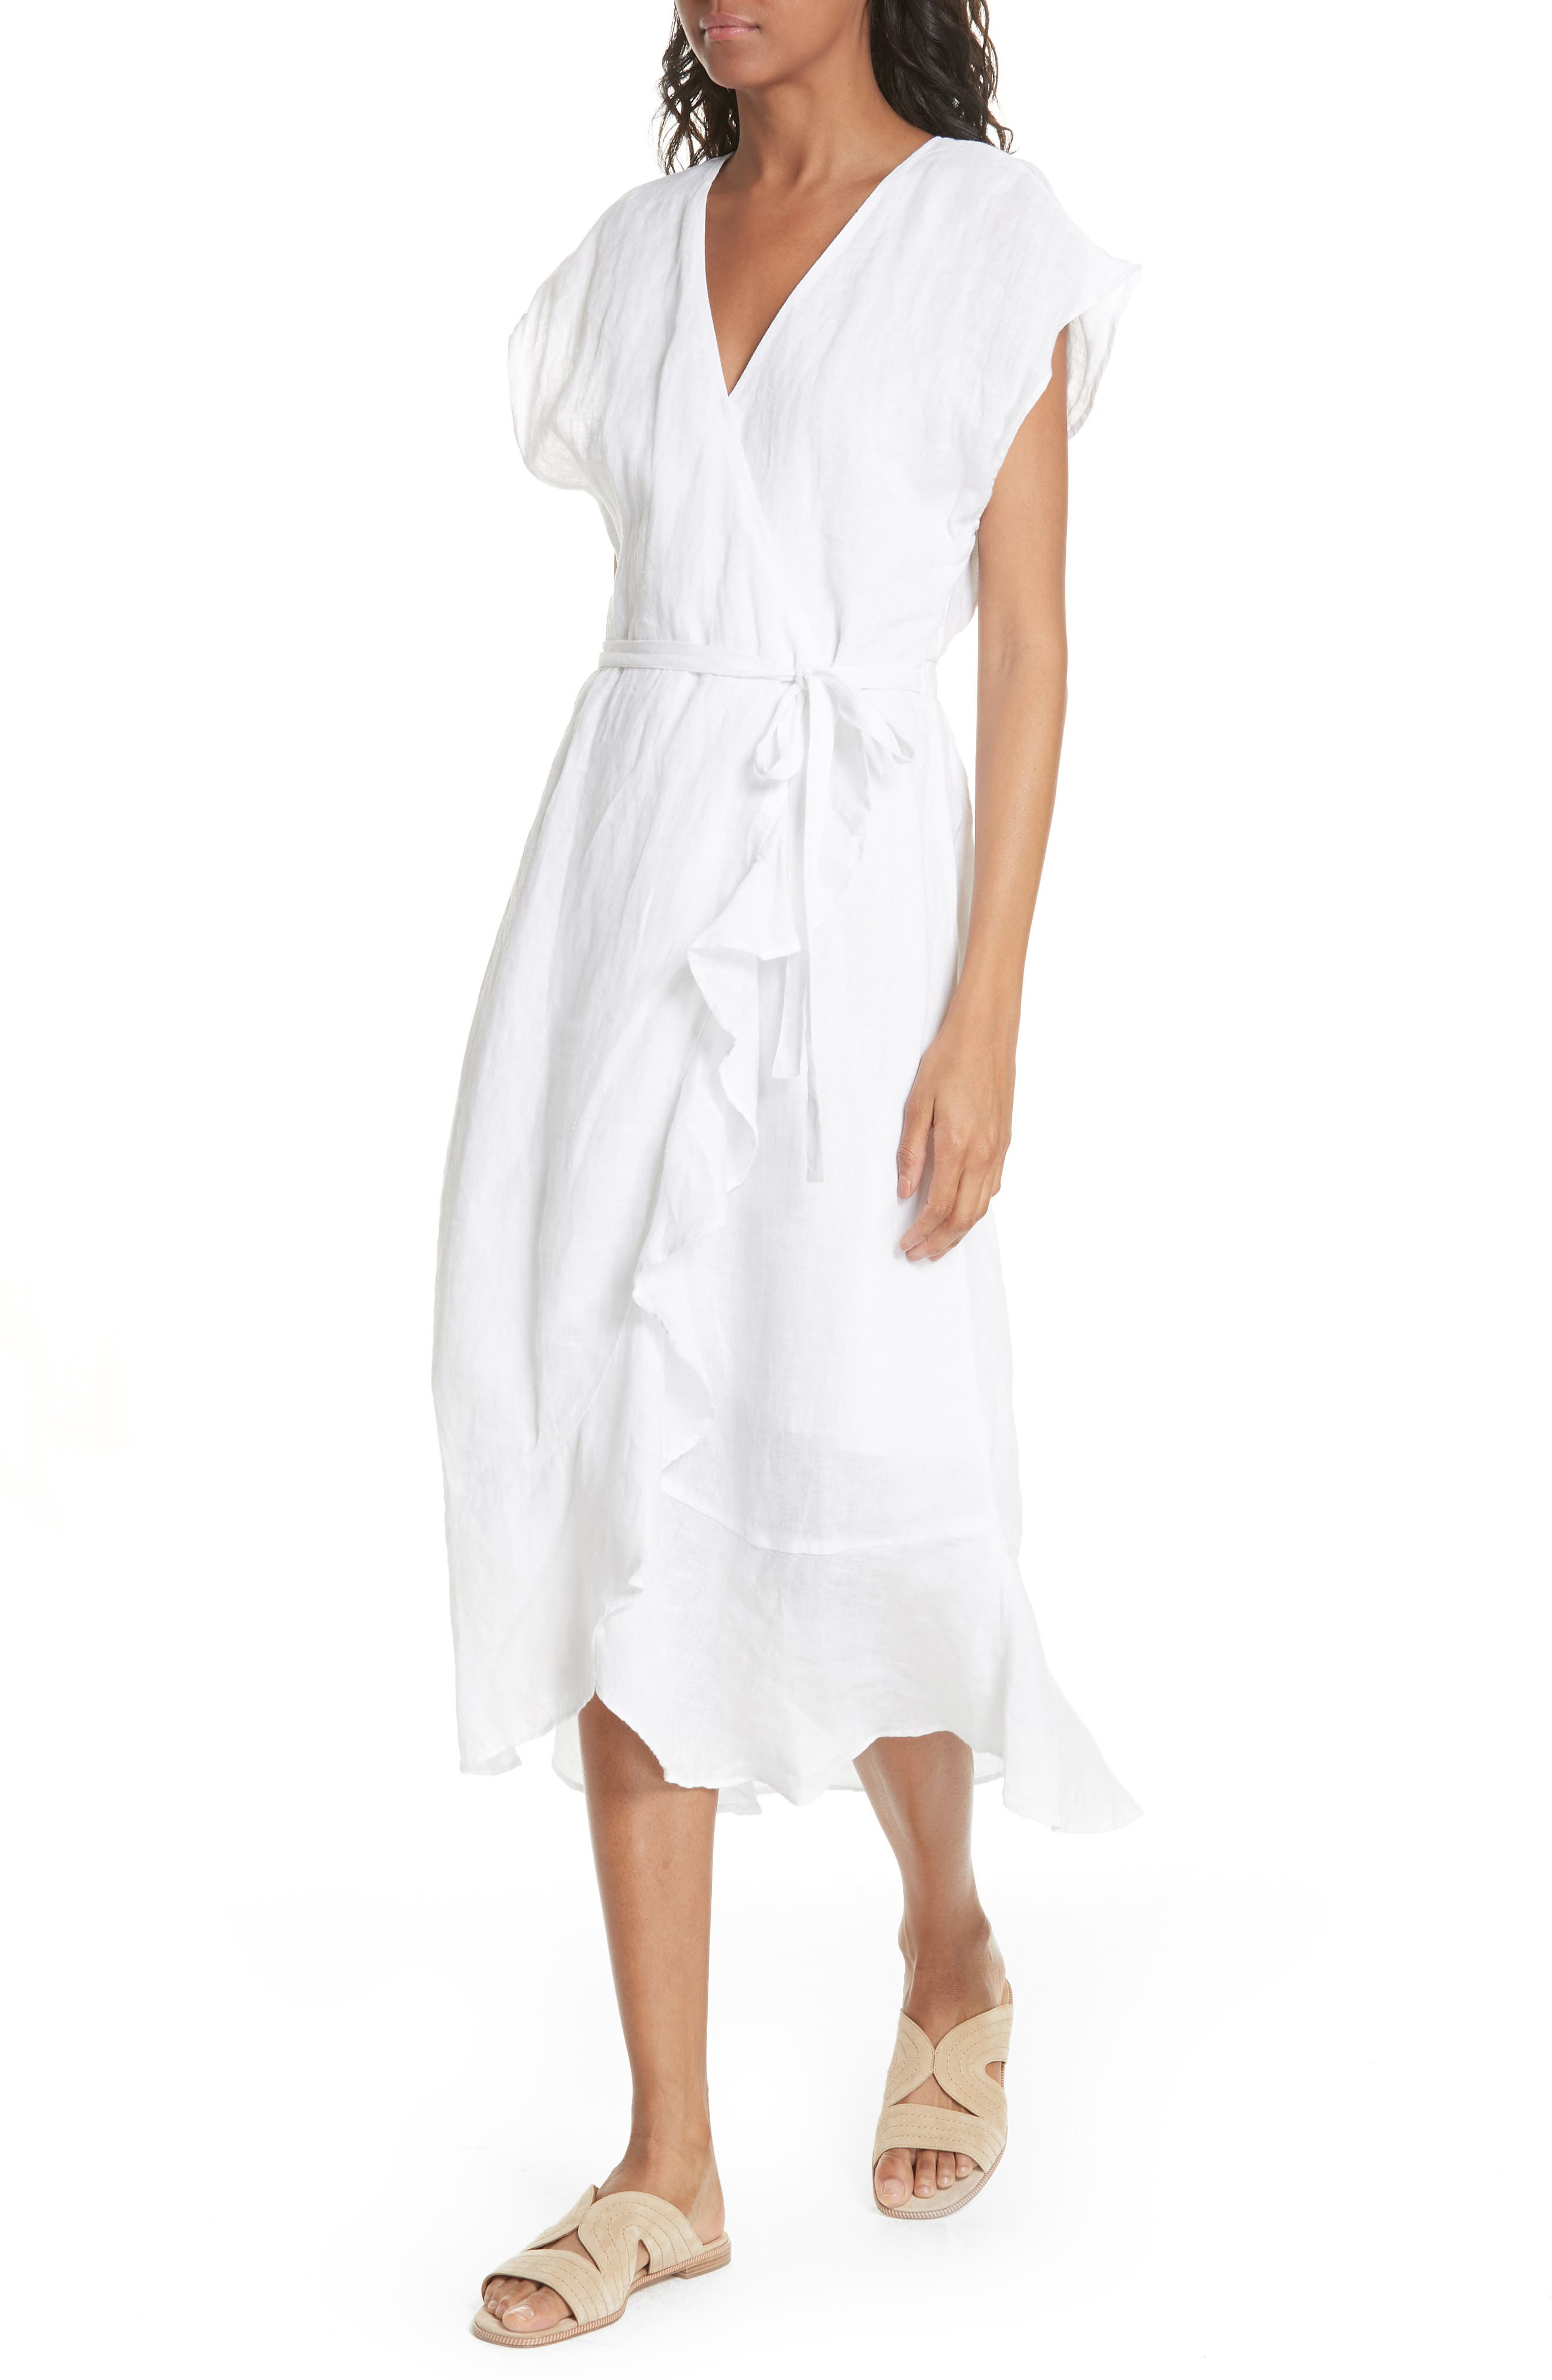 Filma Back Cutout Linen Wrap Dress,                             Alternate thumbnail 4, color,                             PORCELAIN